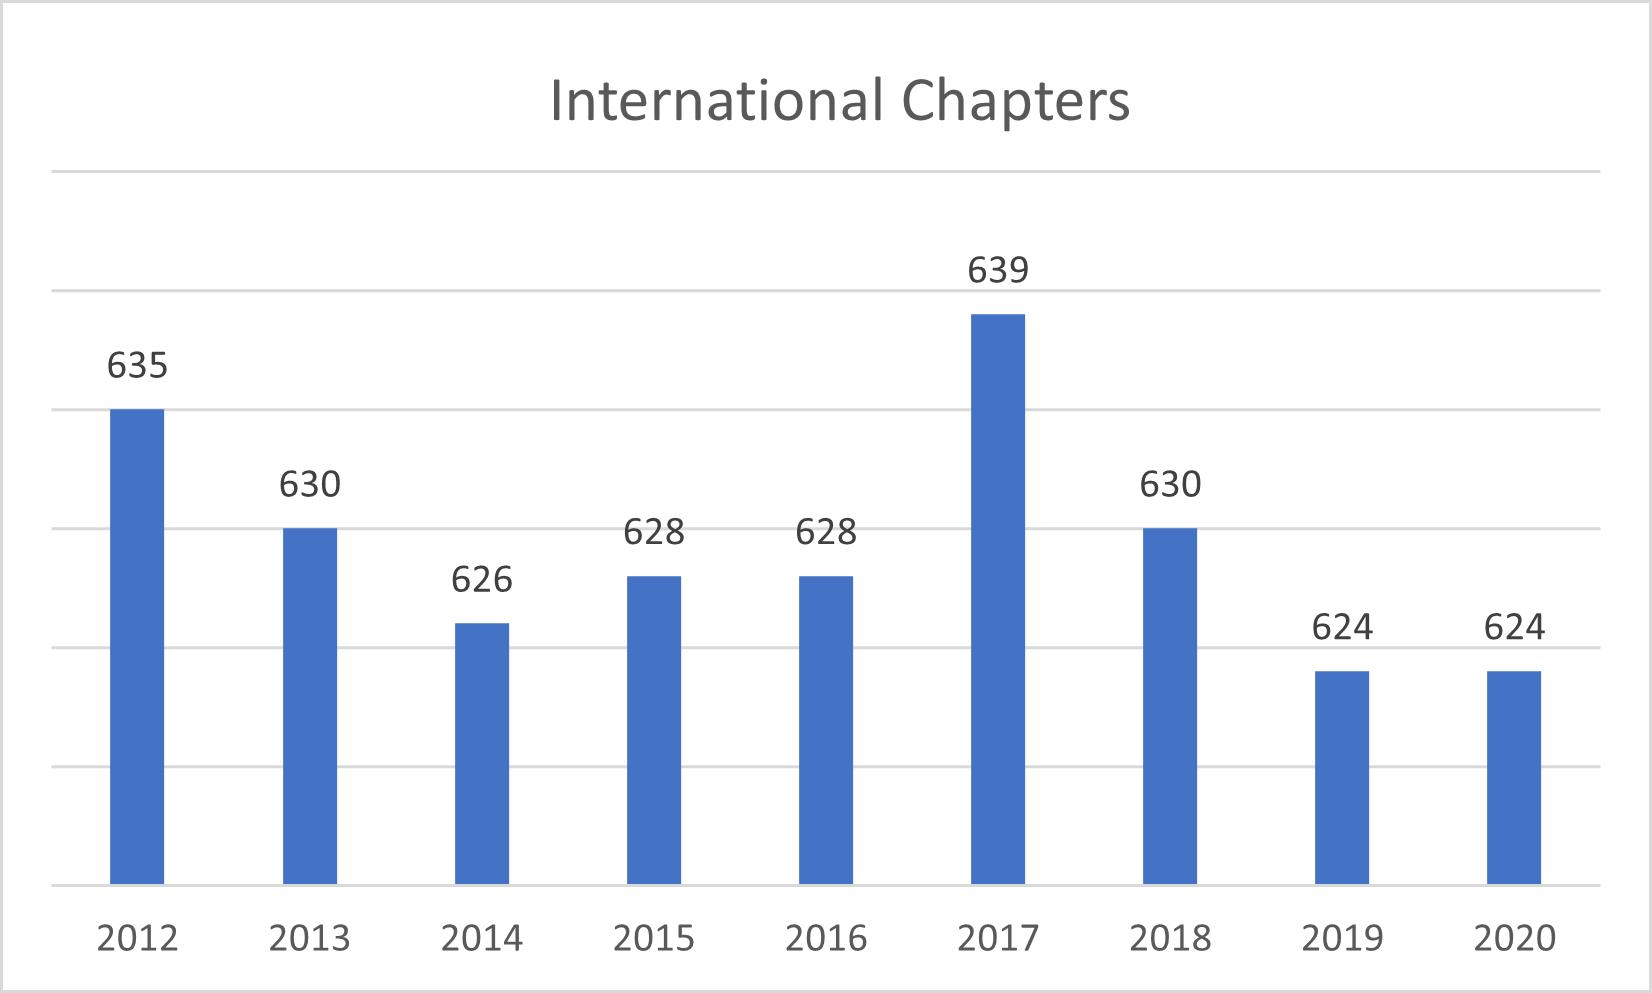 Intl Chapter Chart 102520